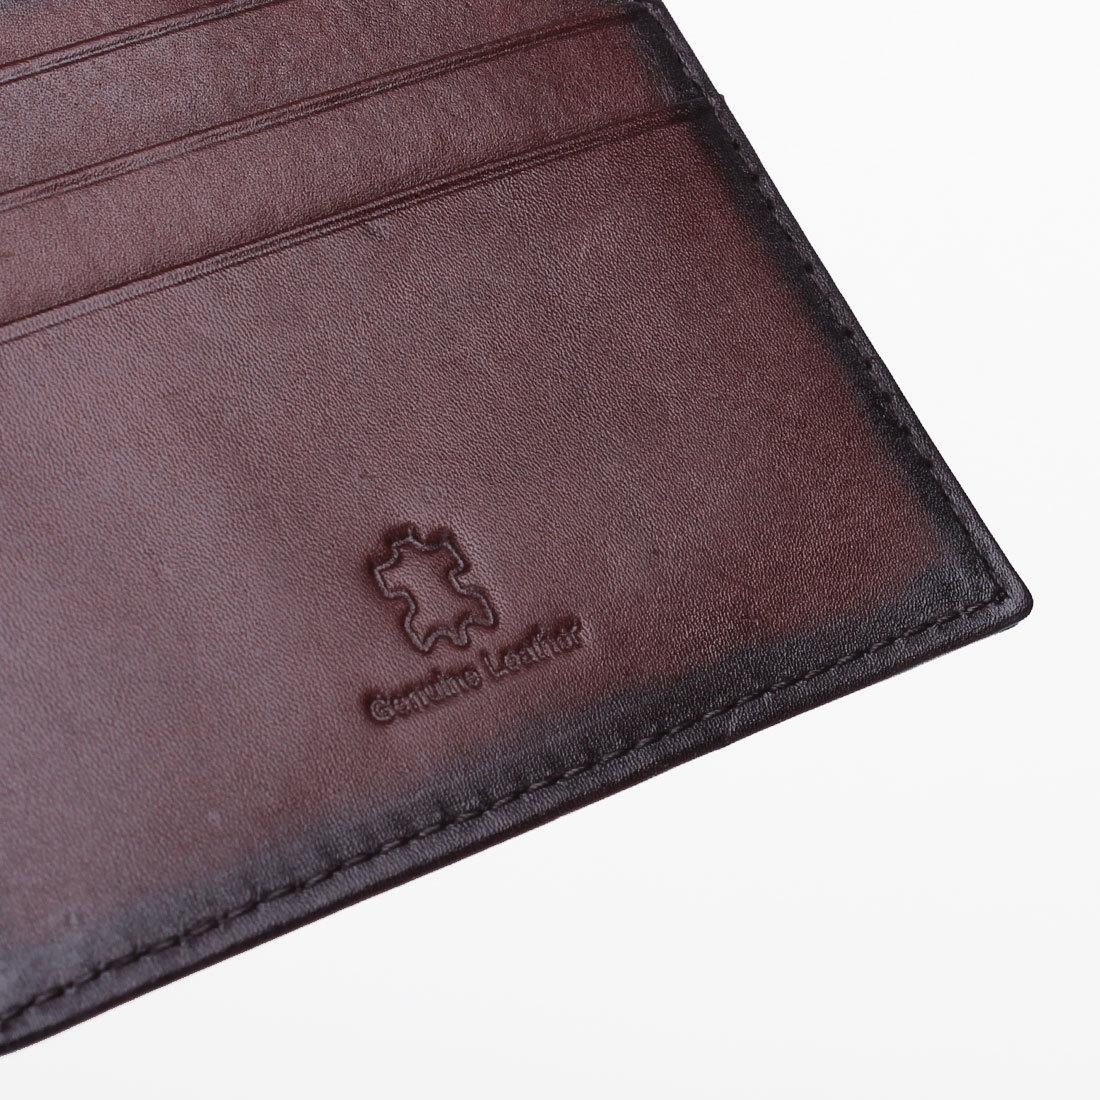 520 - Футляр для карт Stampa Brio